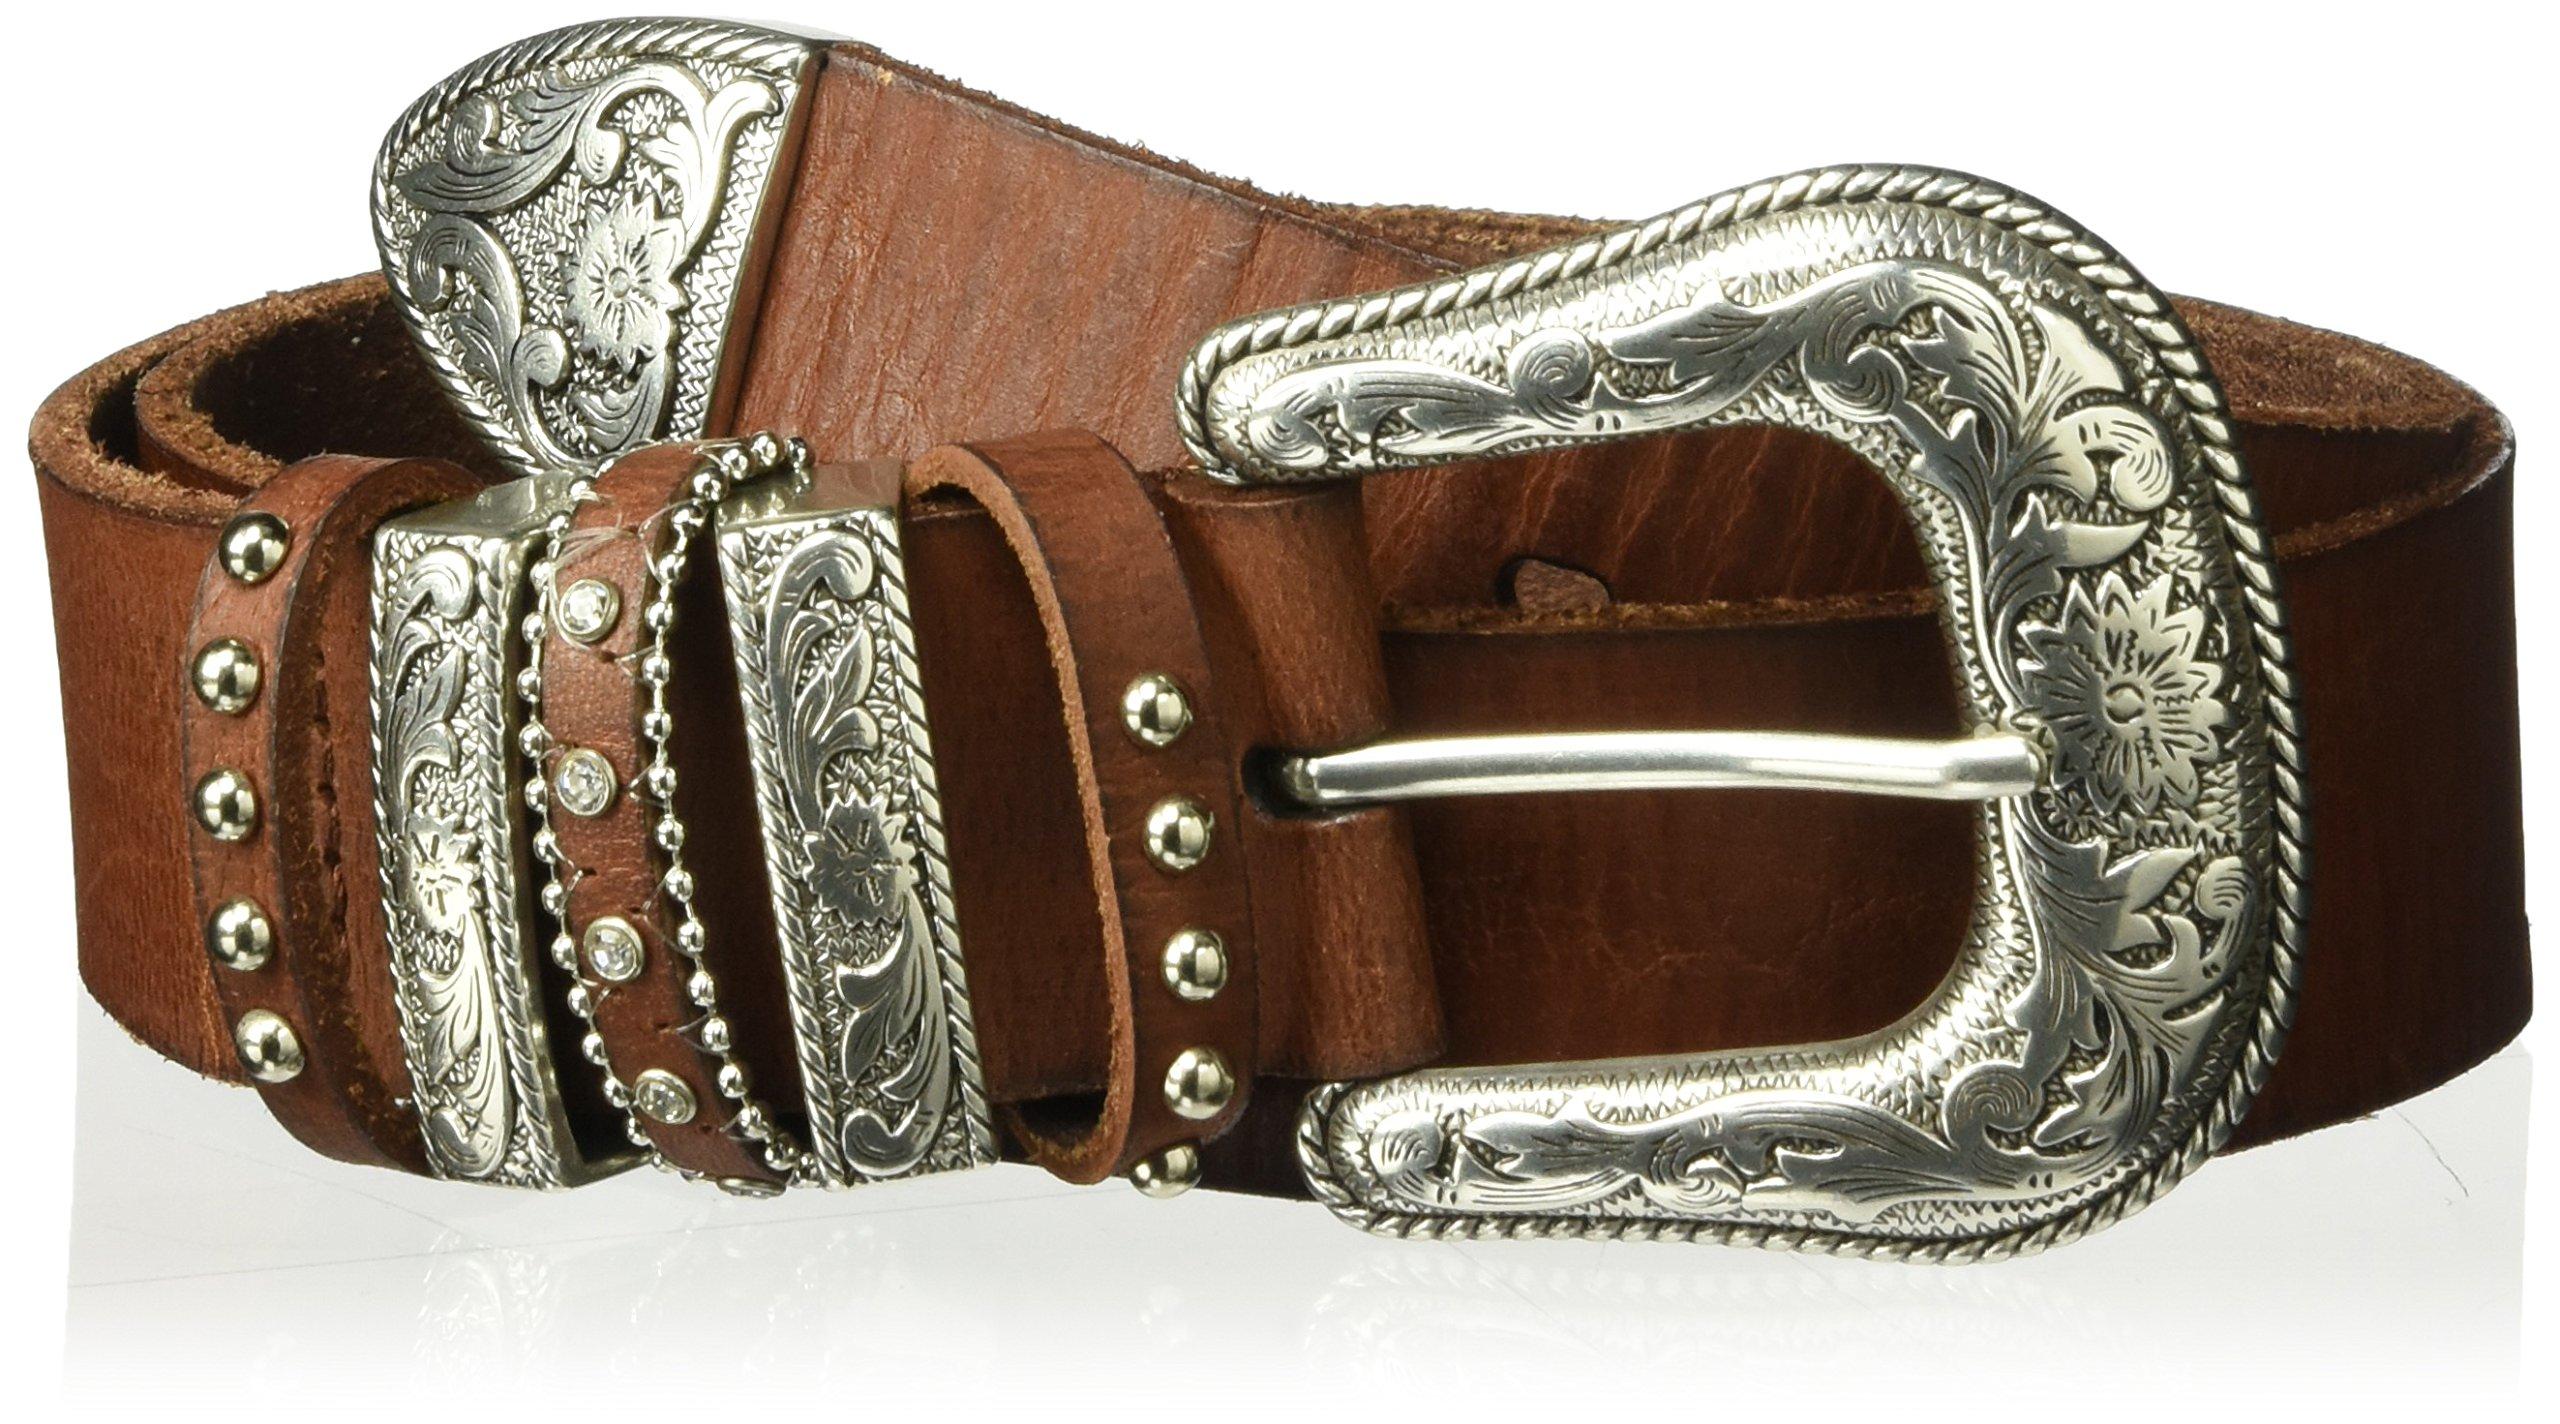 Nocona Belt Co. Women's Multi Keeper Buckle Set Belt, Brown, Extra Large